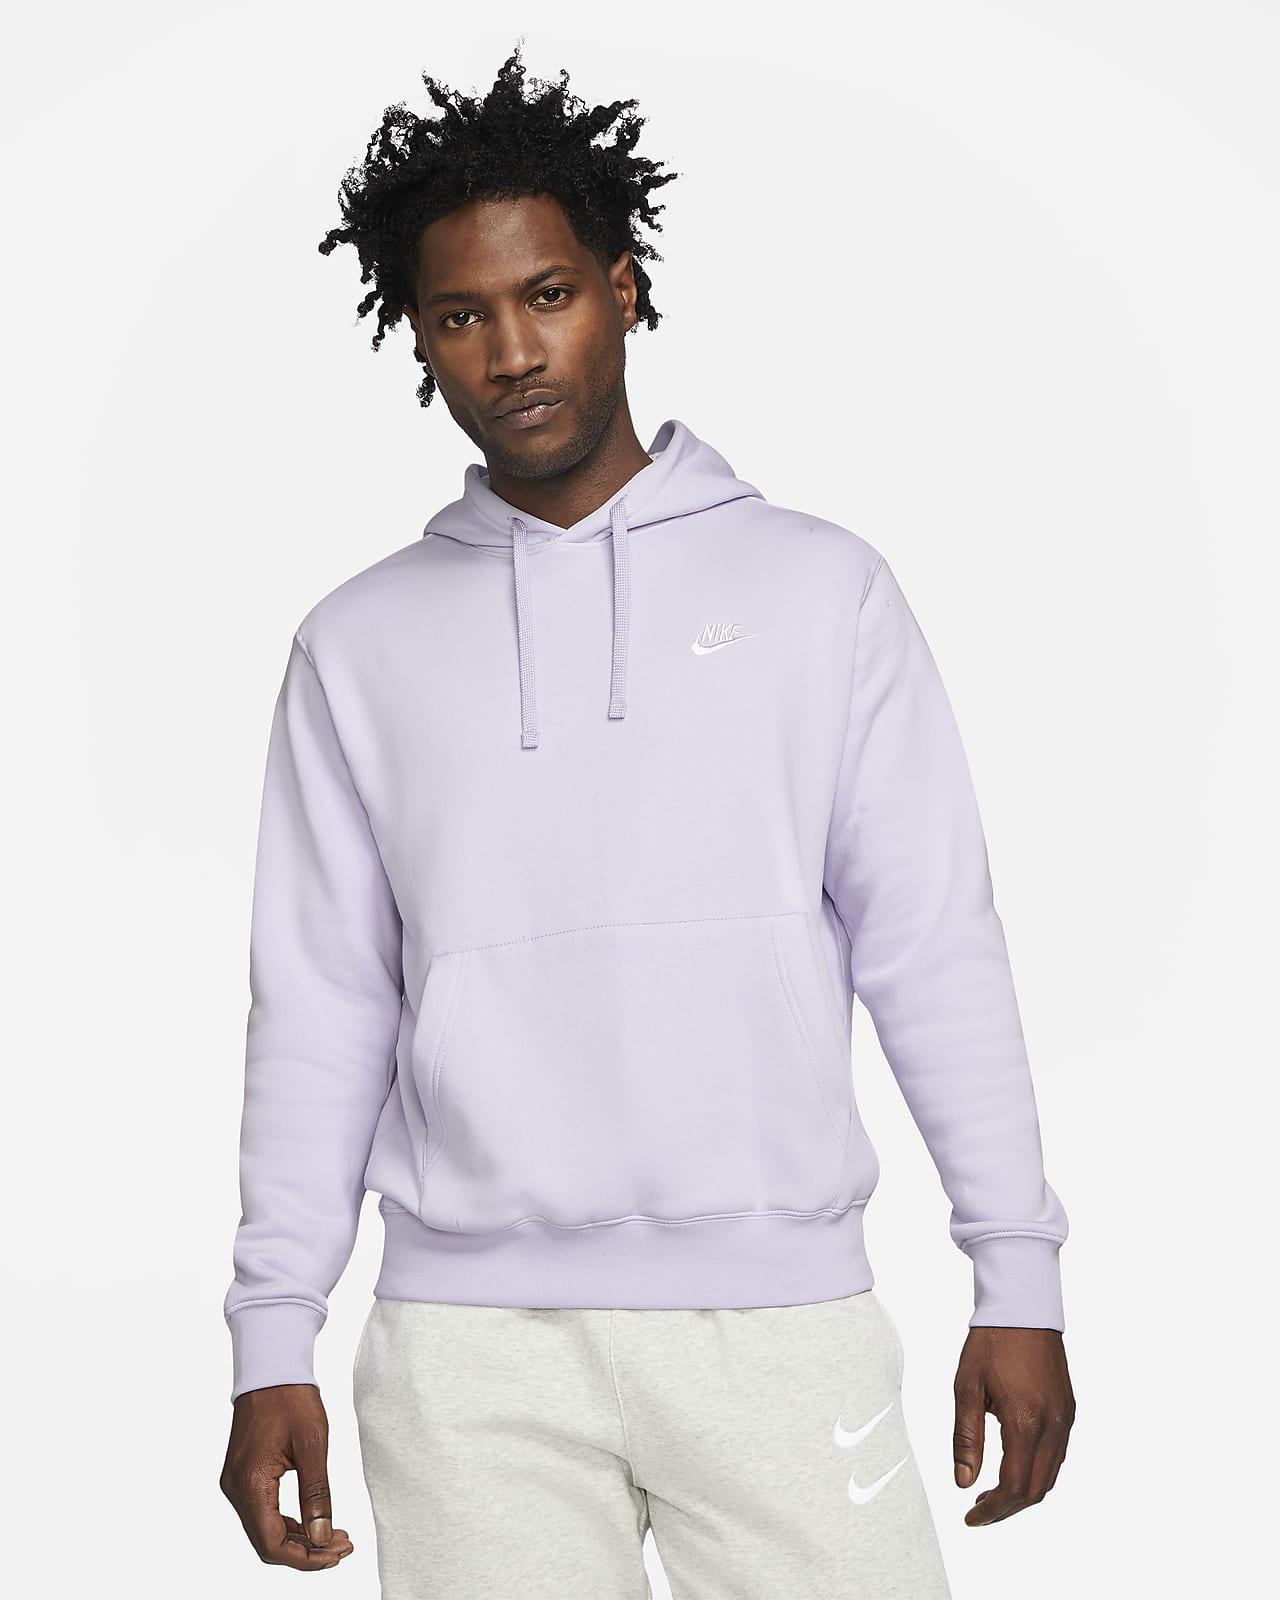 Felpa pullover con cappuccio Nike Sportswear Club Fleece - Uomo